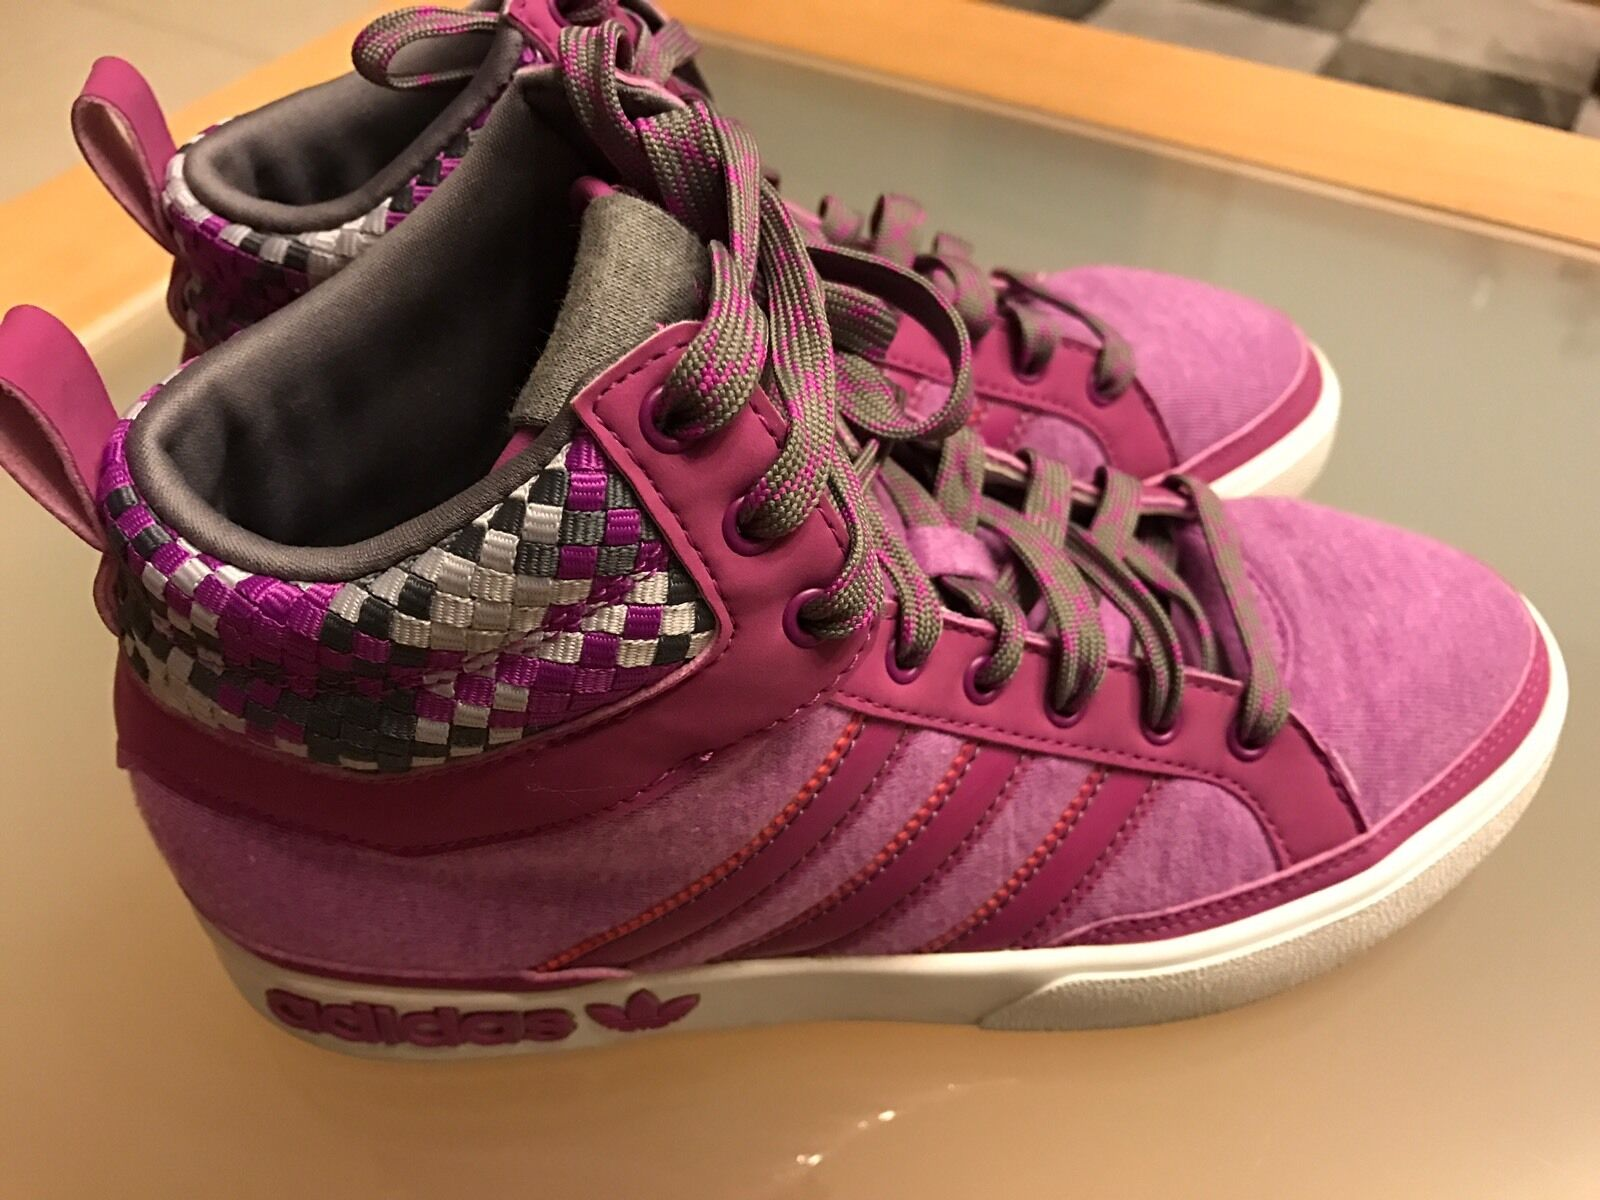 Adidas Top Schuhe Court High W-Friendship Athletic Schuhe Top Pink Größe 37 / UK 6 dc18f3